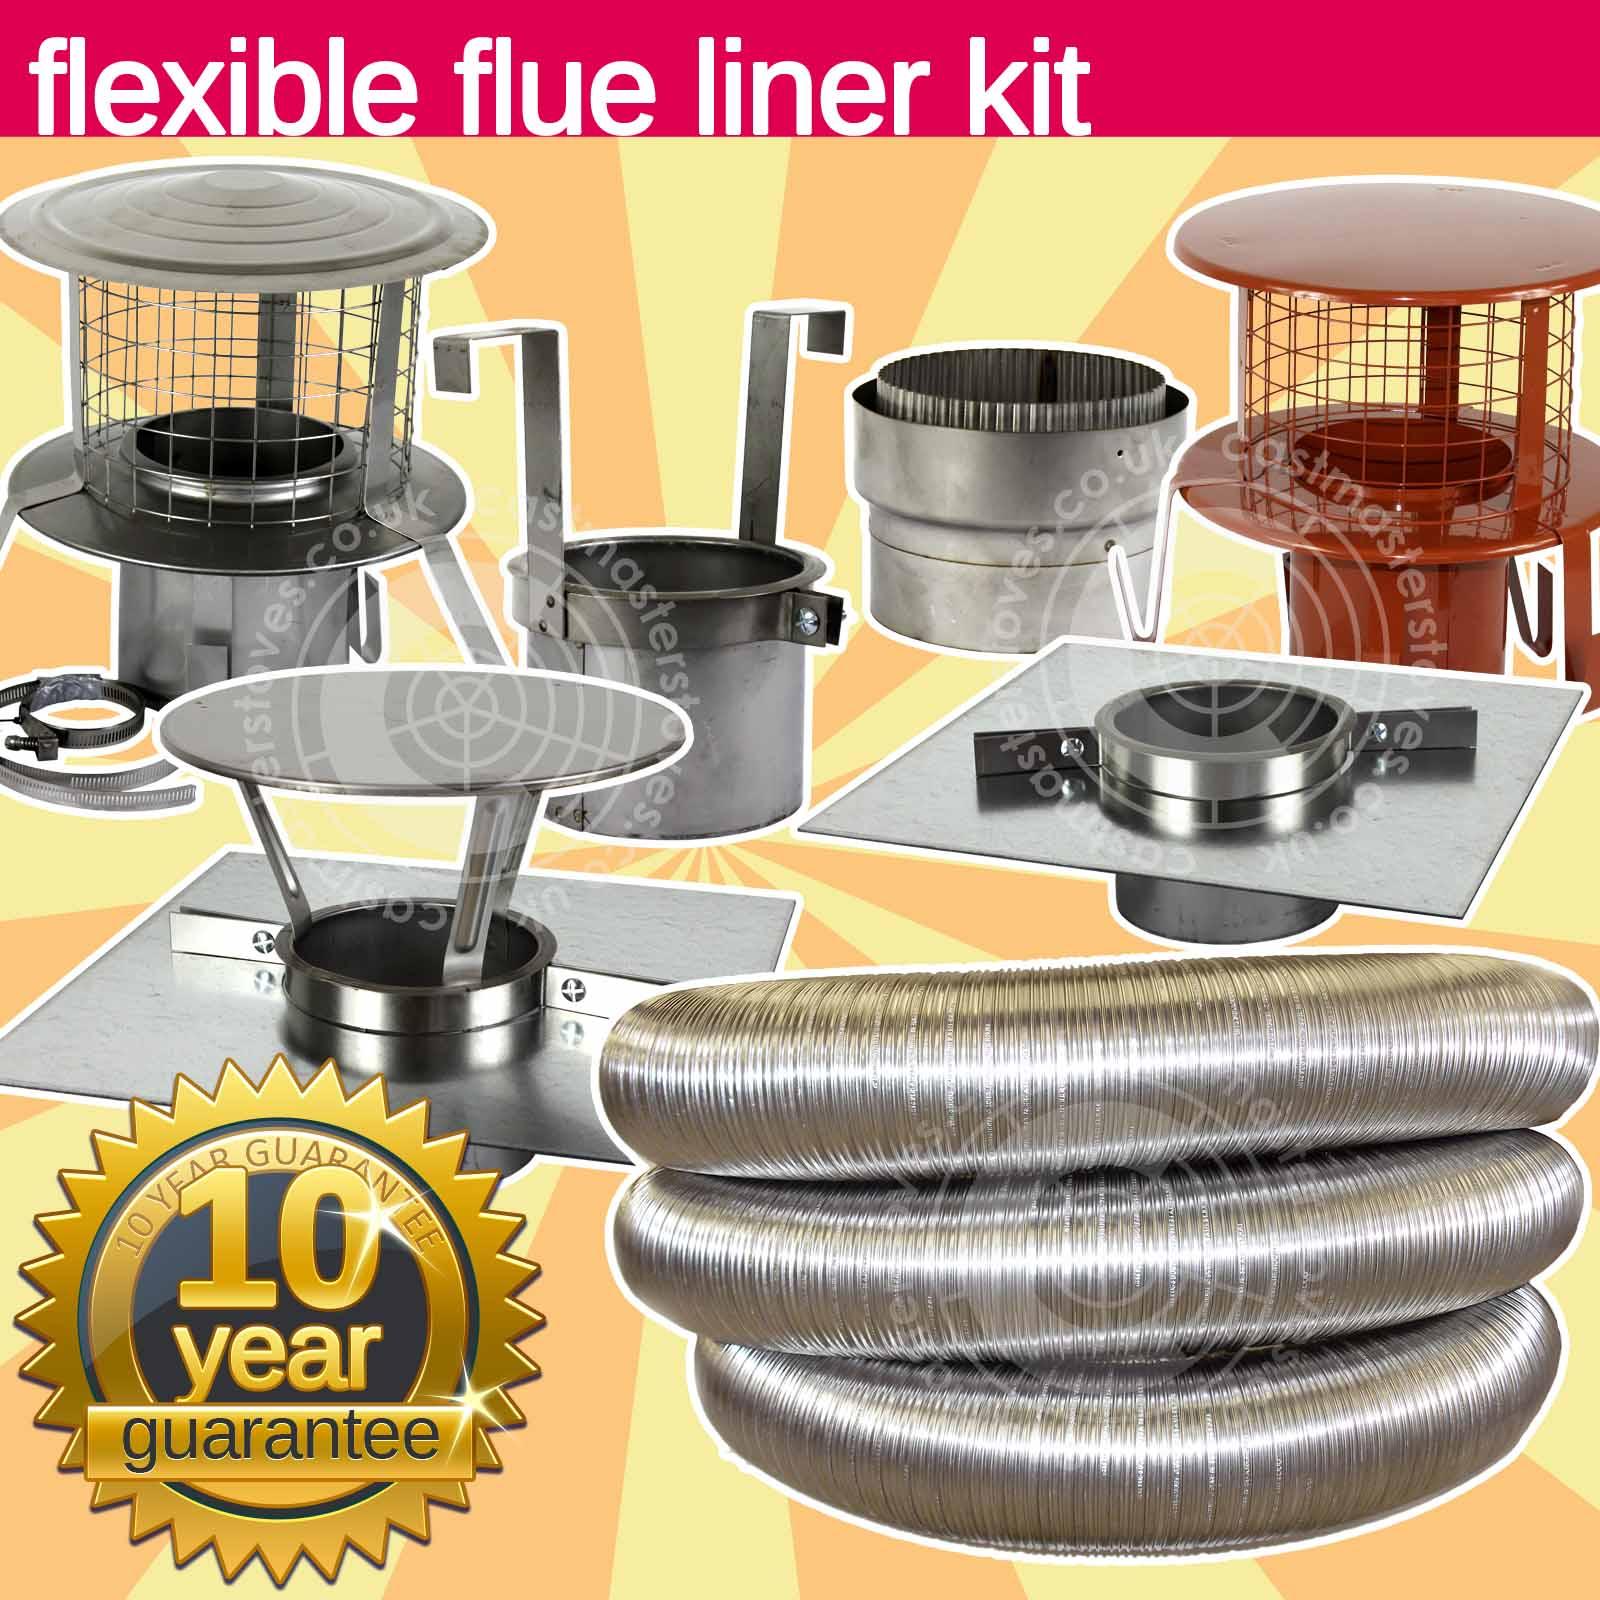 6 Quot Inch 150mm Stainless Steel Flue Liner Amp Fitting Kit For